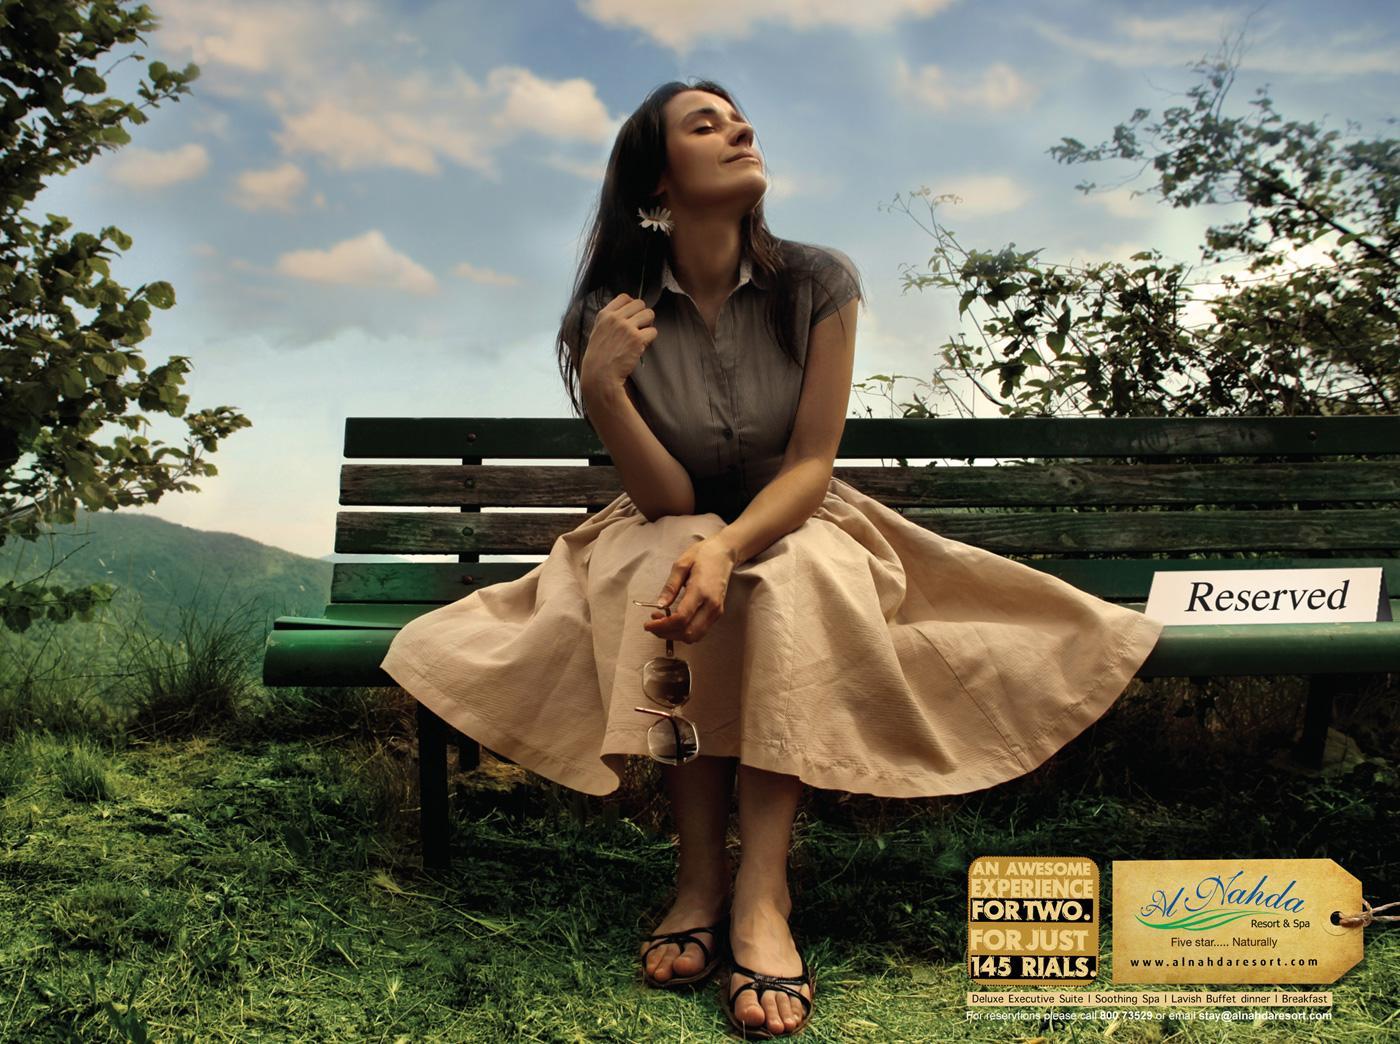 Al Nahda Resort & Spa Print Ad -  Bench